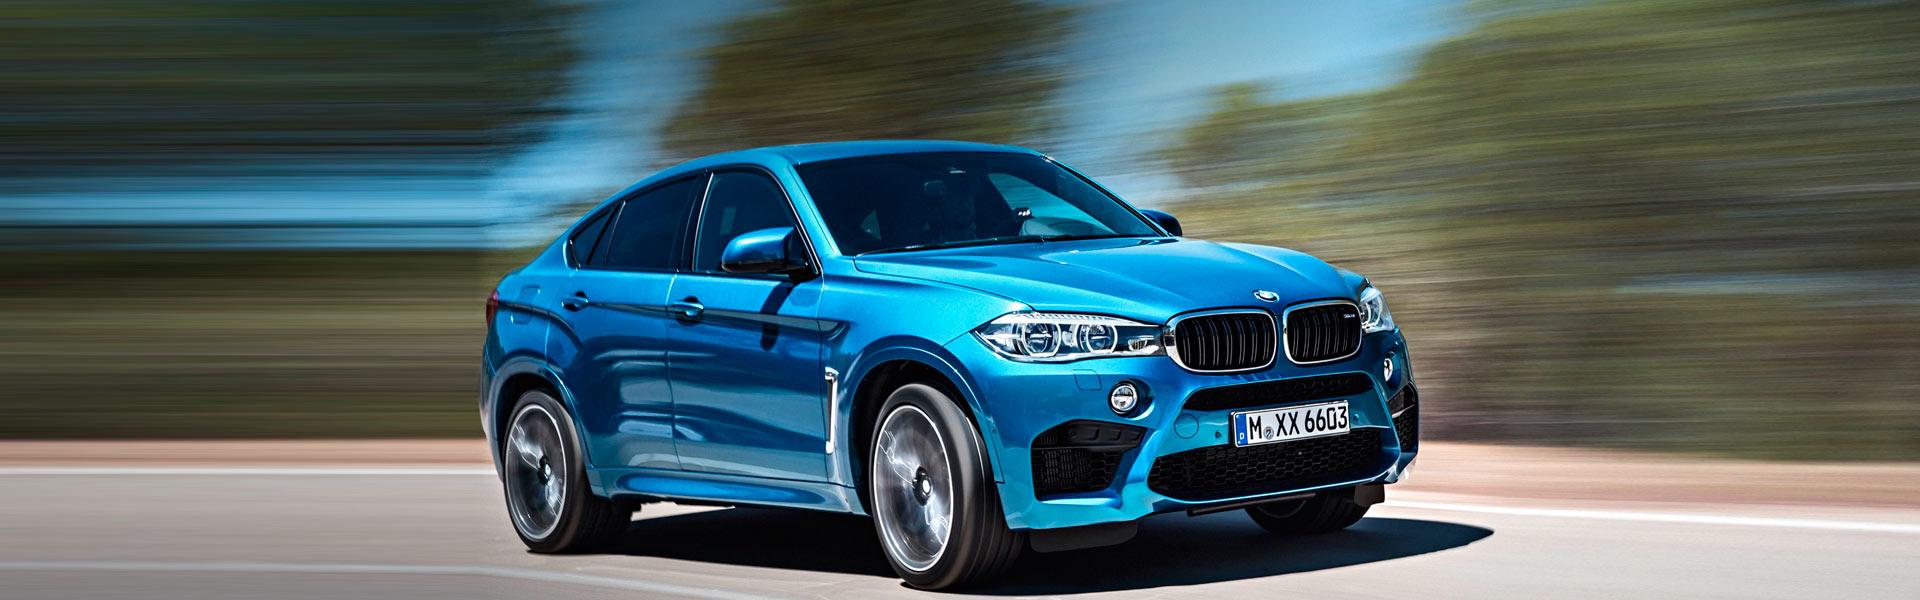 Моторное масло на BMW X6